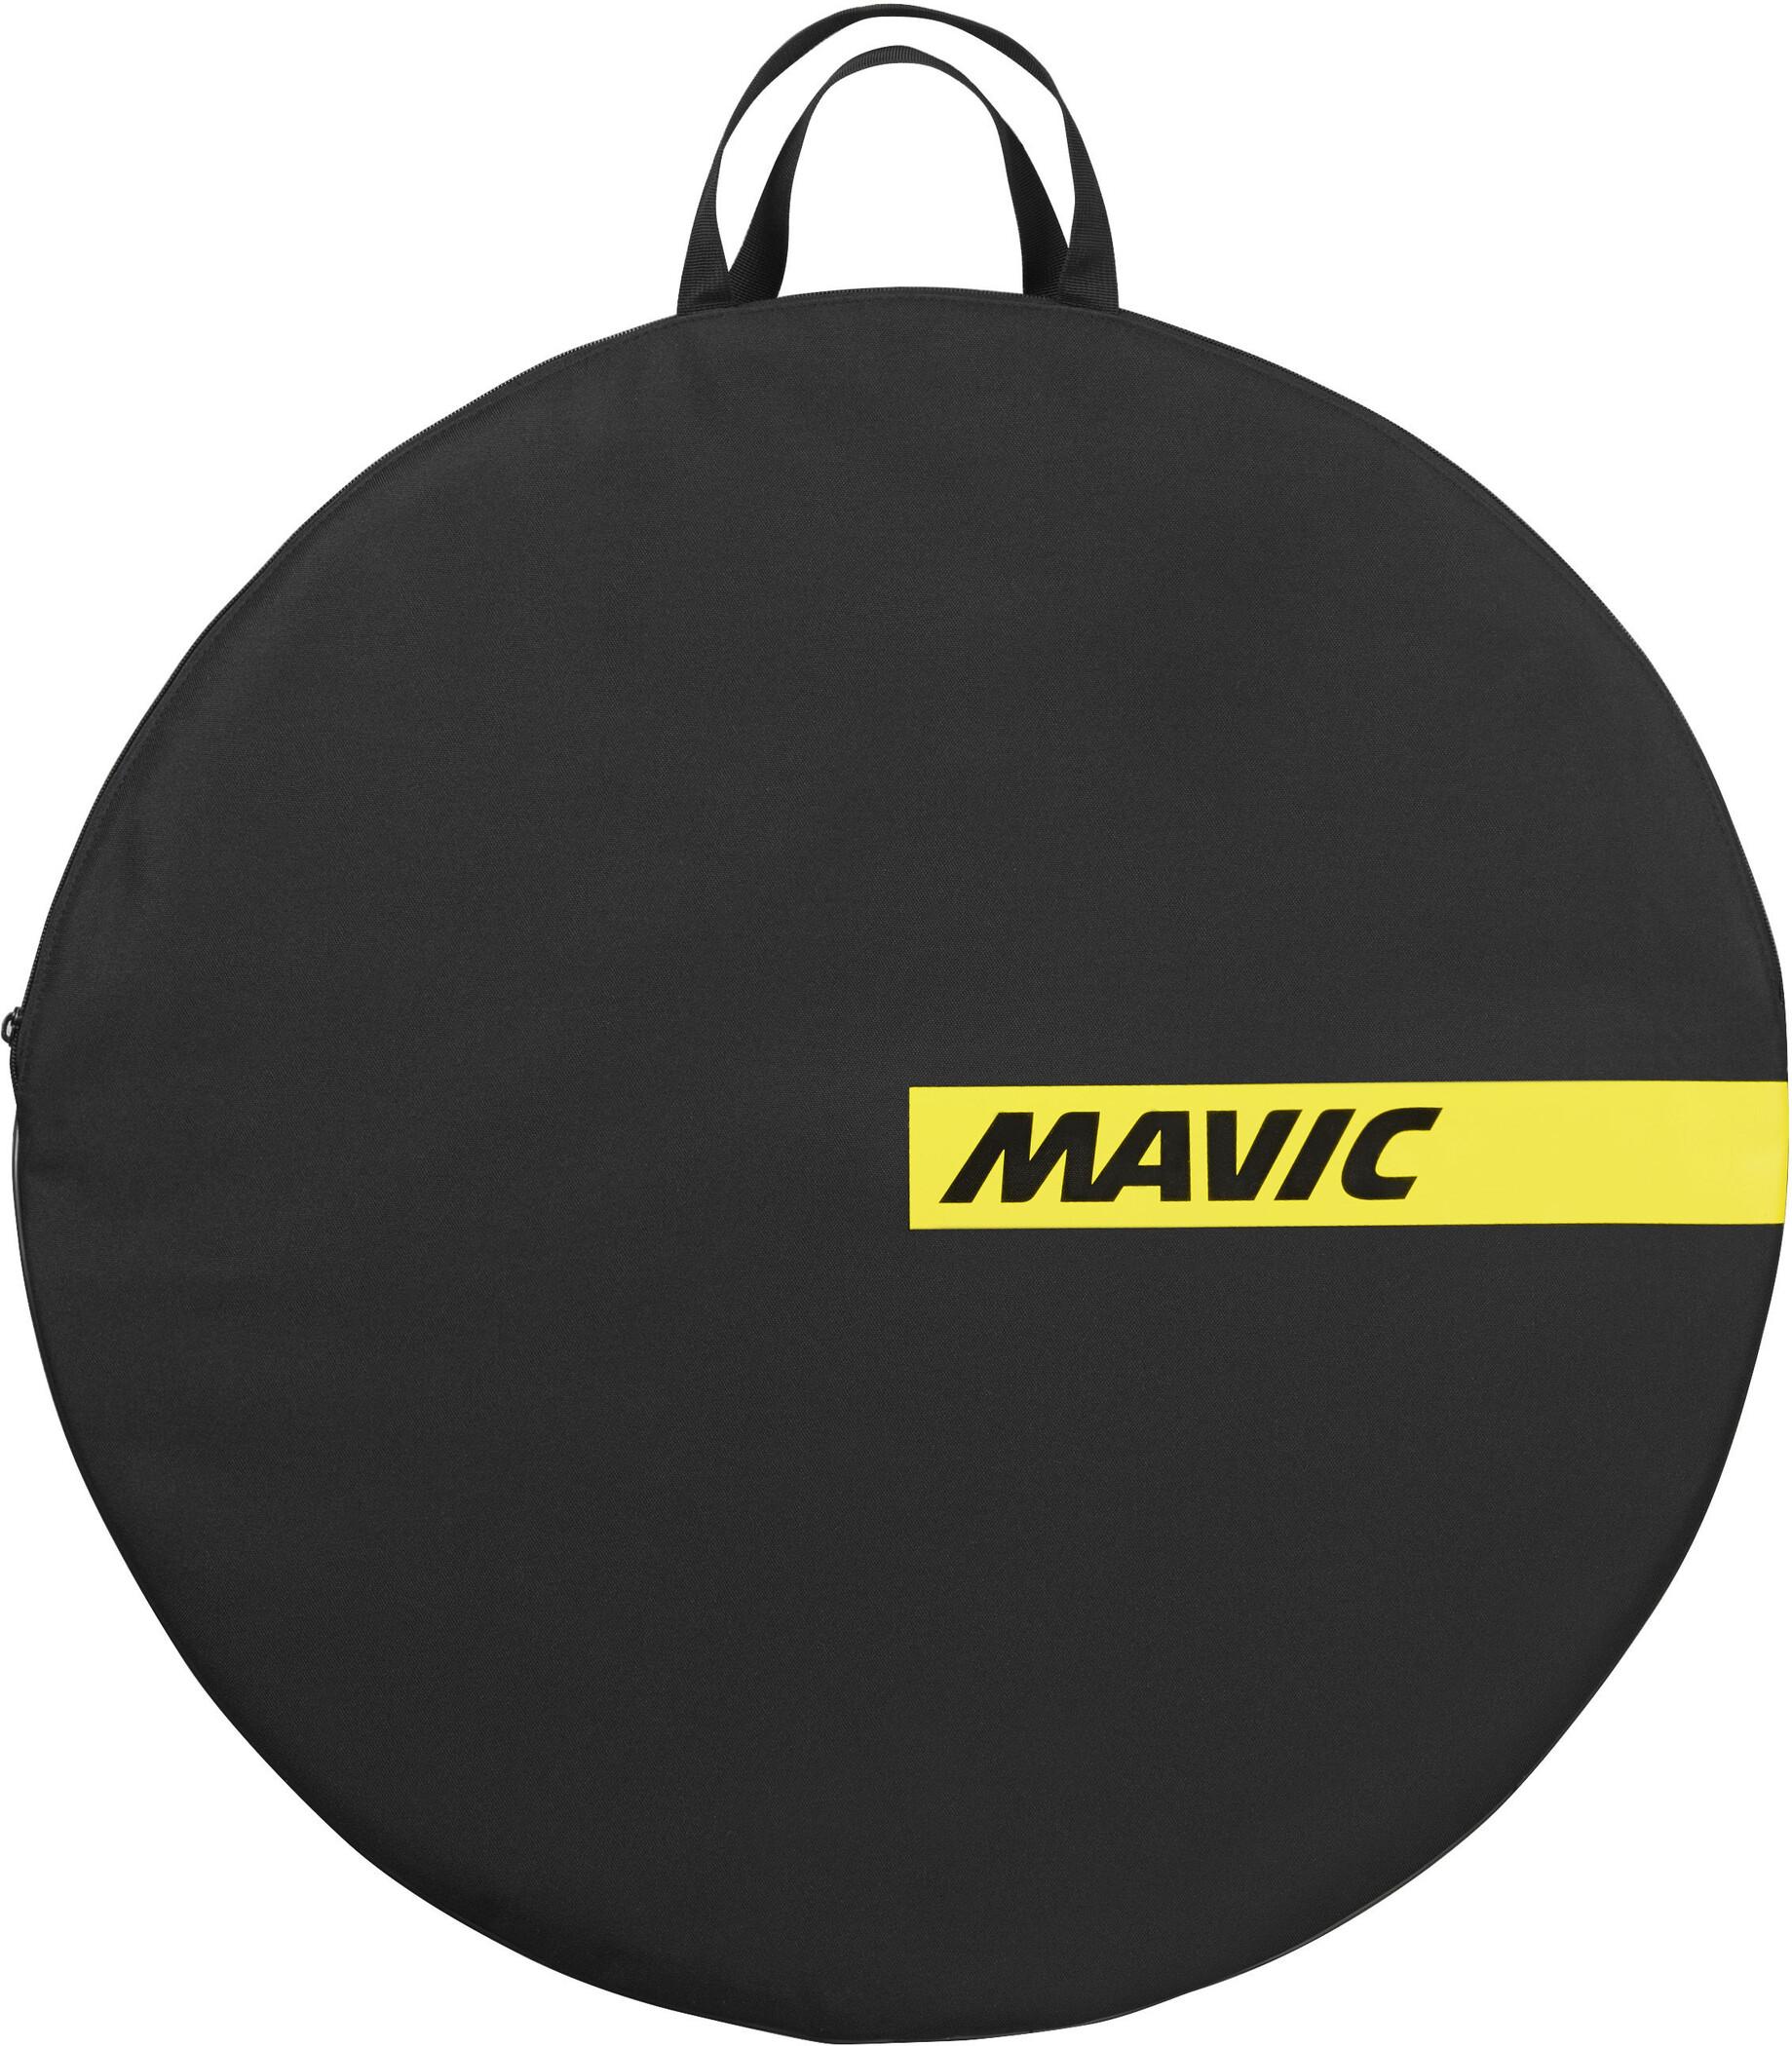 Mavic Racercykel Hjultaske (2019)   Wheel bags